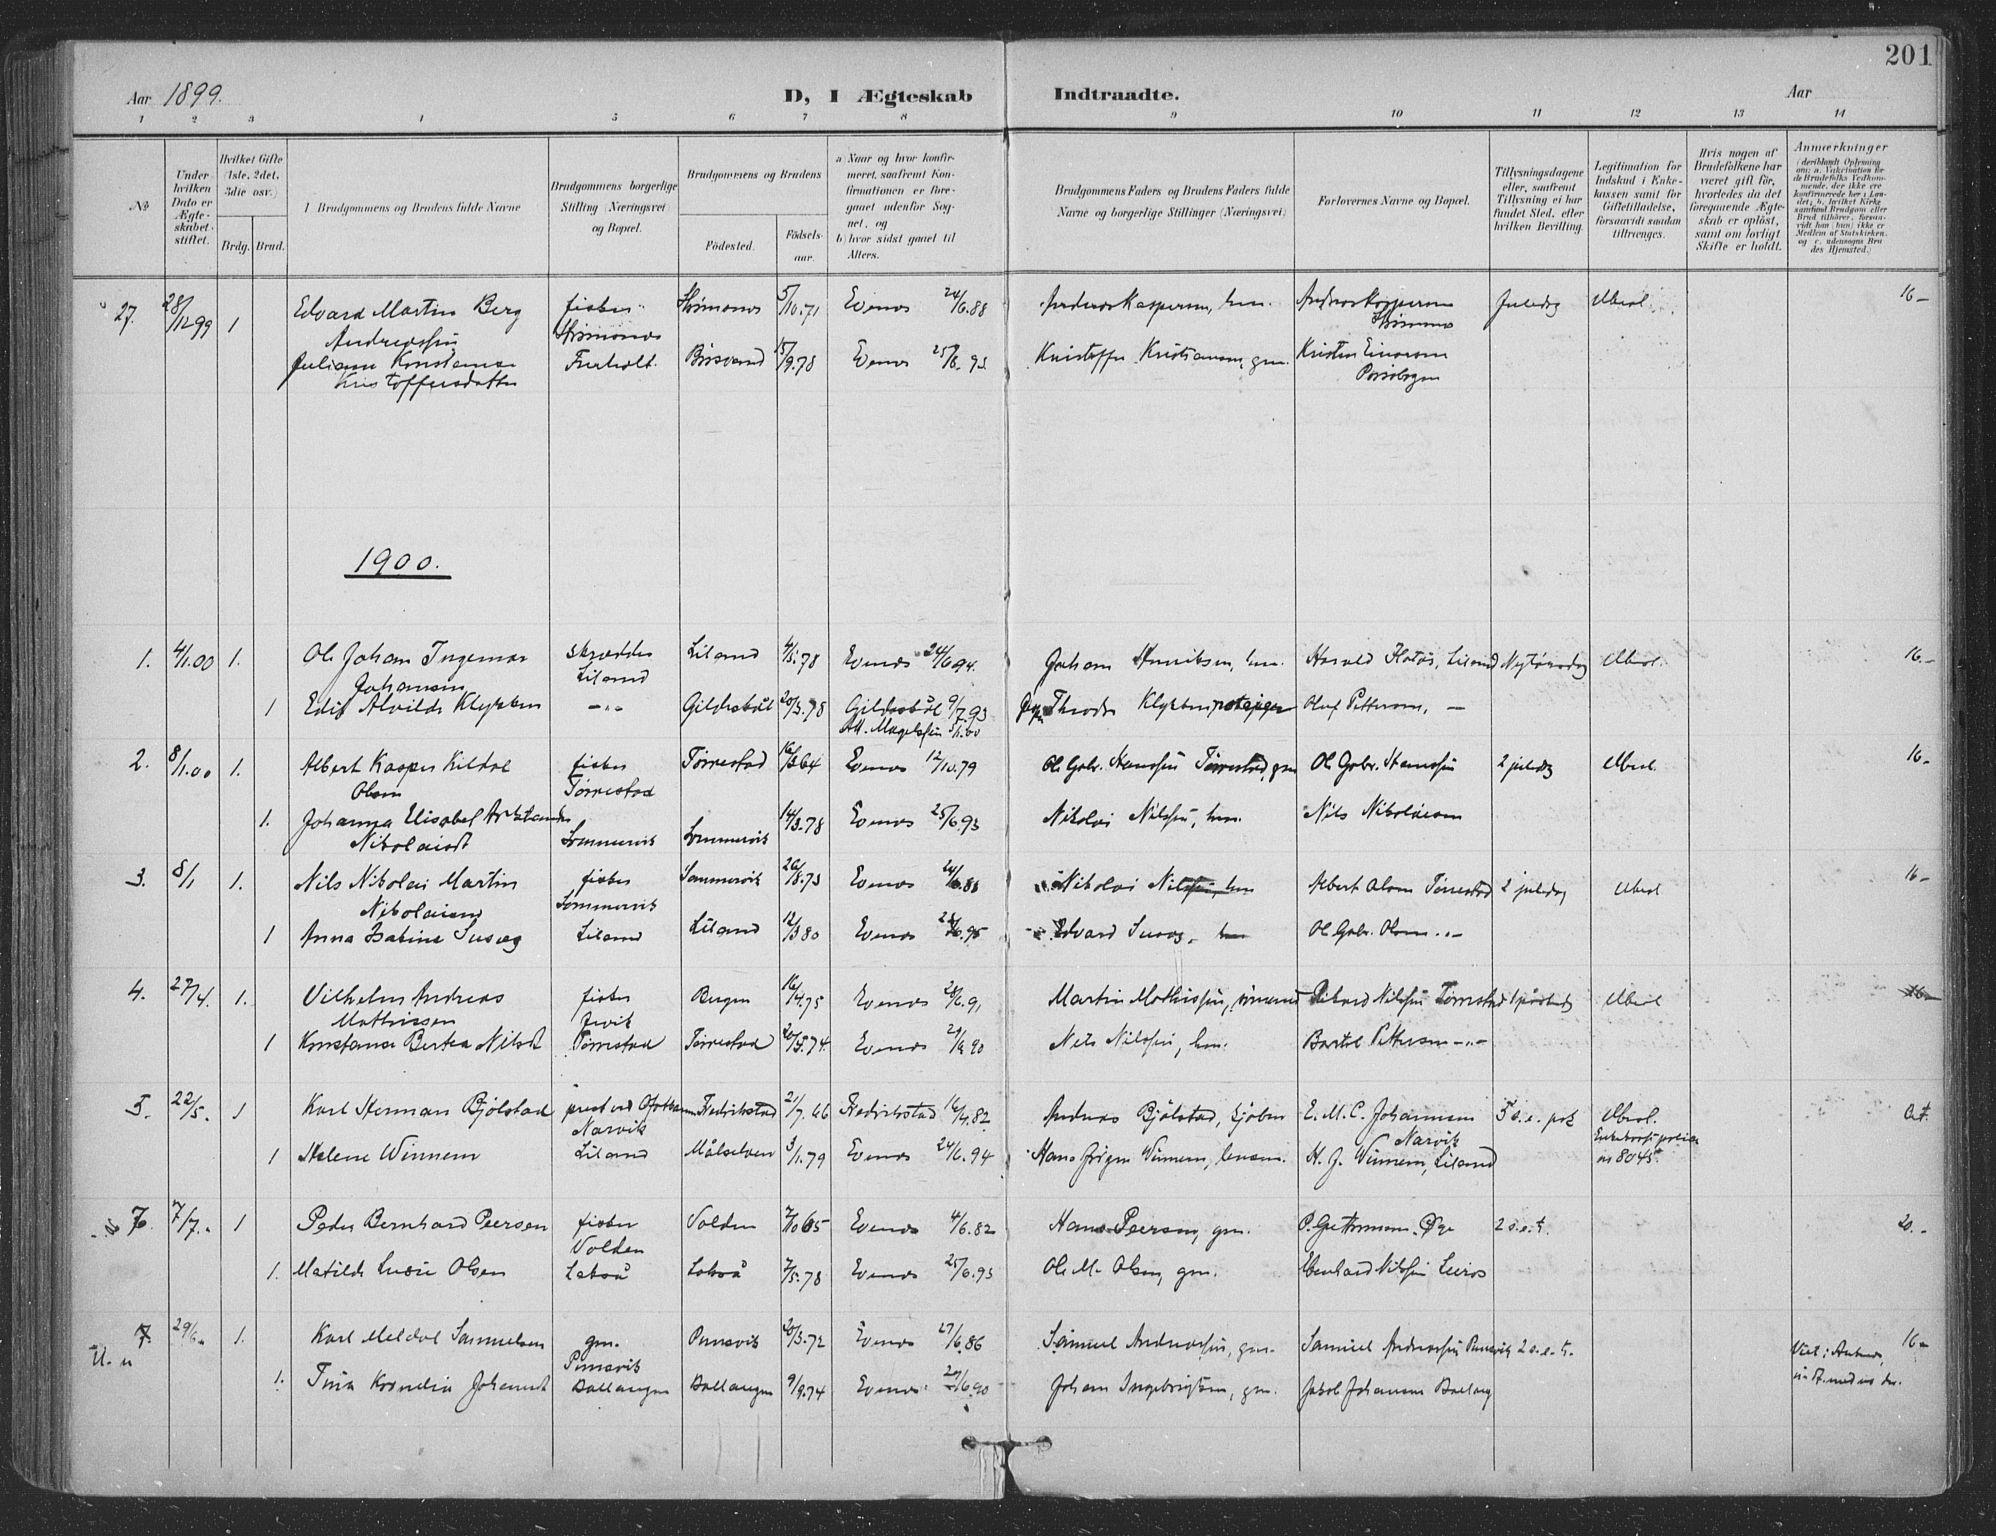 SAT, Ministerialprotokoller, klokkerbøker og fødselsregistre - Nordland, 863/L0899: Ministerialbok nr. 863A11, 1897-1906, s. 201